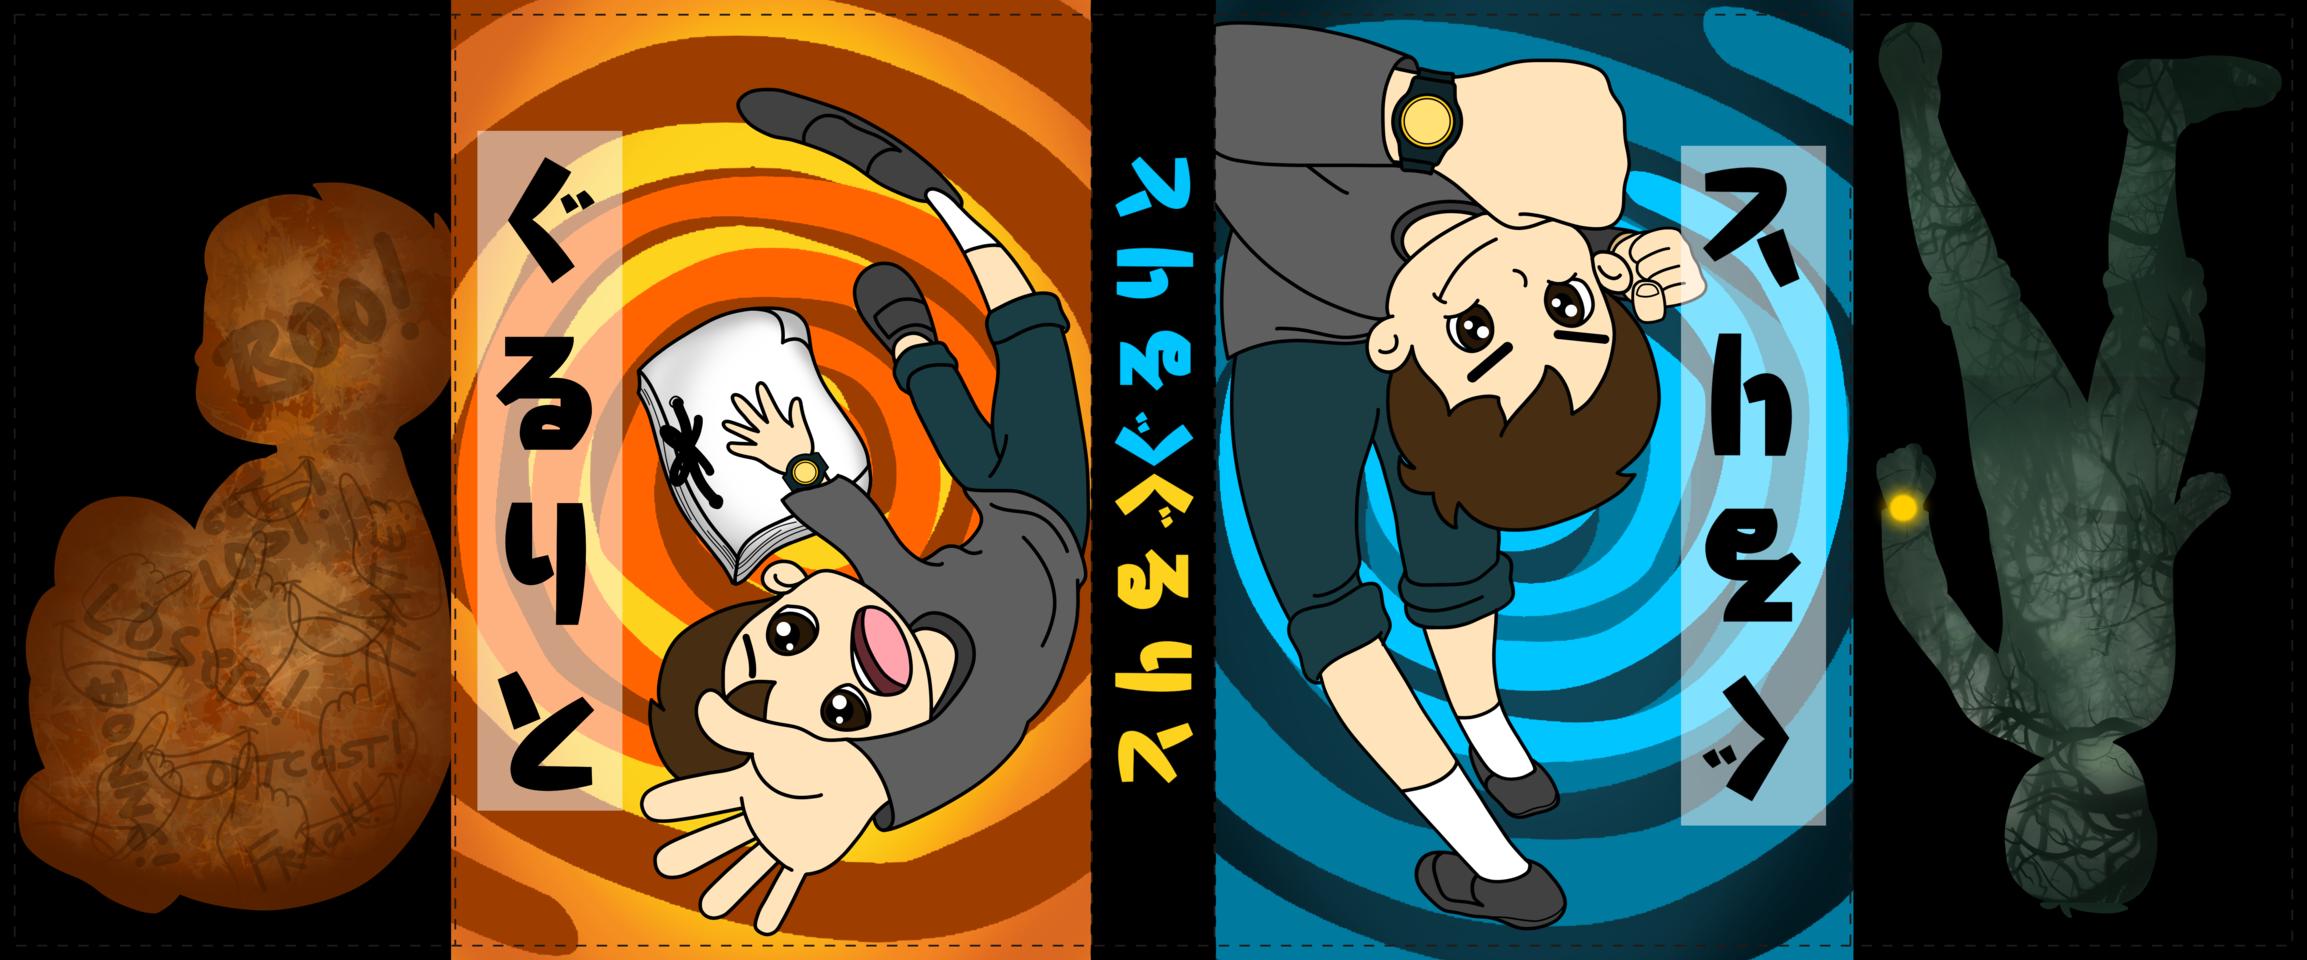 Spinning Illust of K Spinning_contest